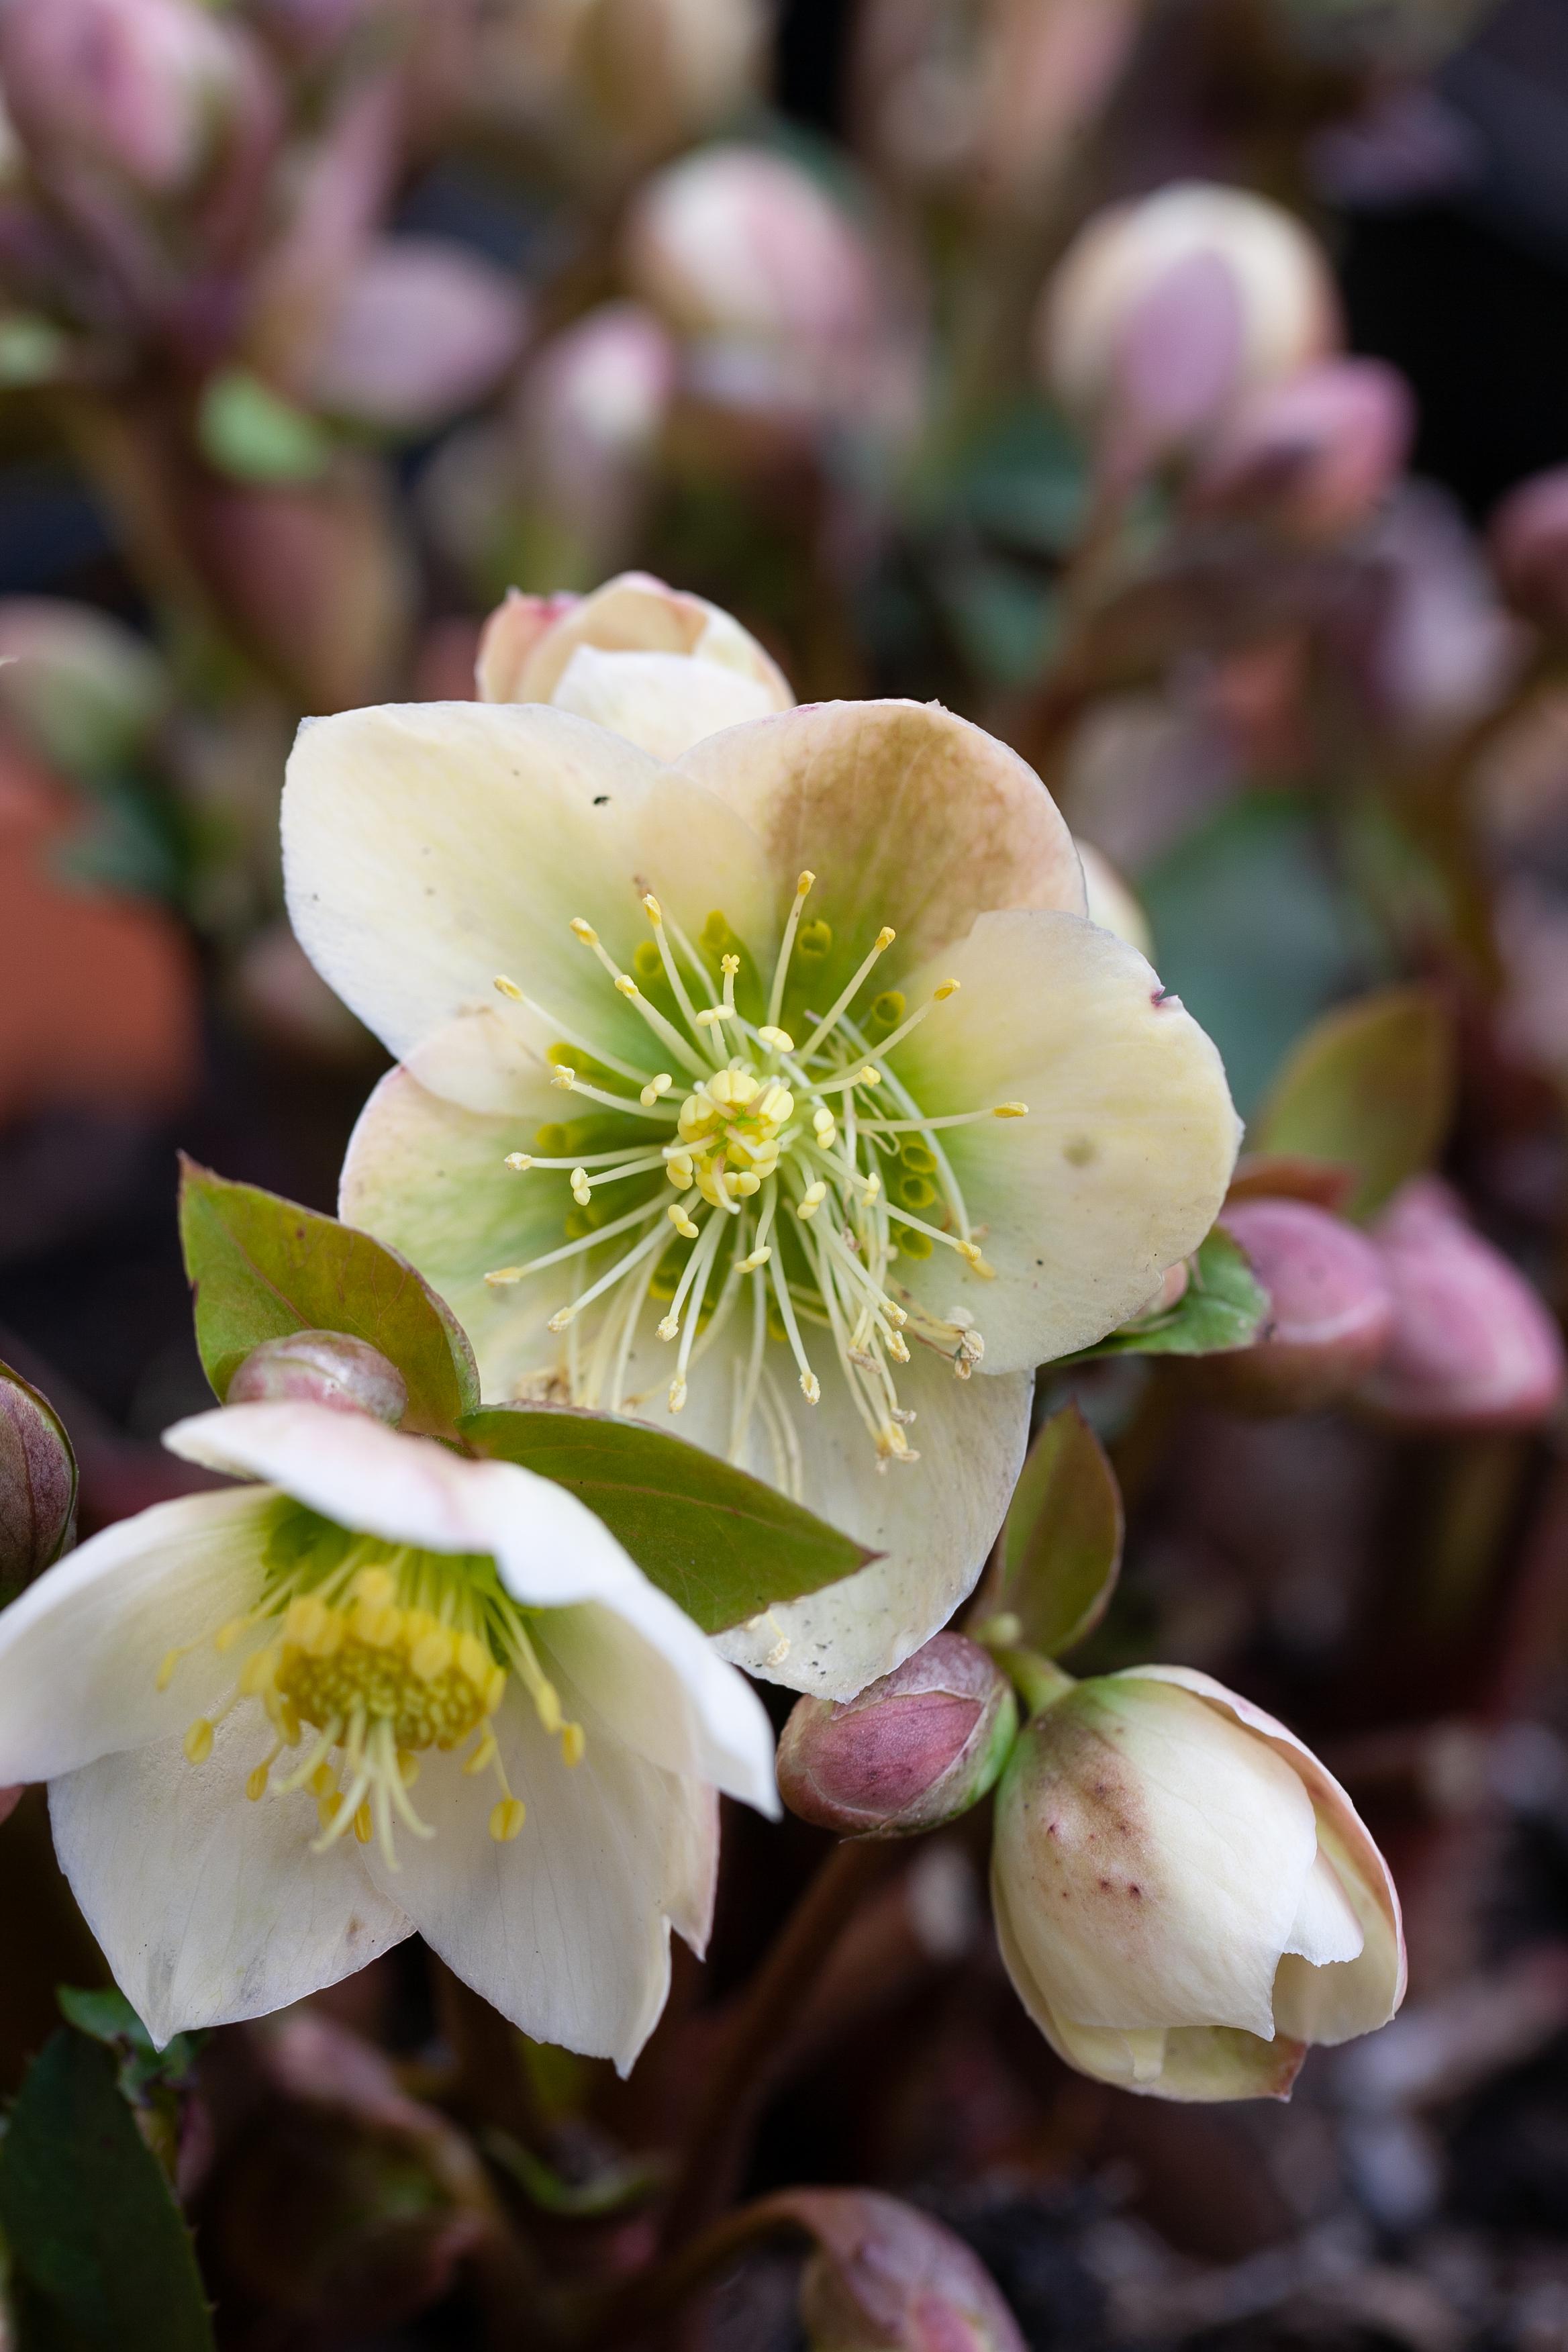 Ivington gardens 24_Feb_2011_Feb 24 2011_1510.jpg